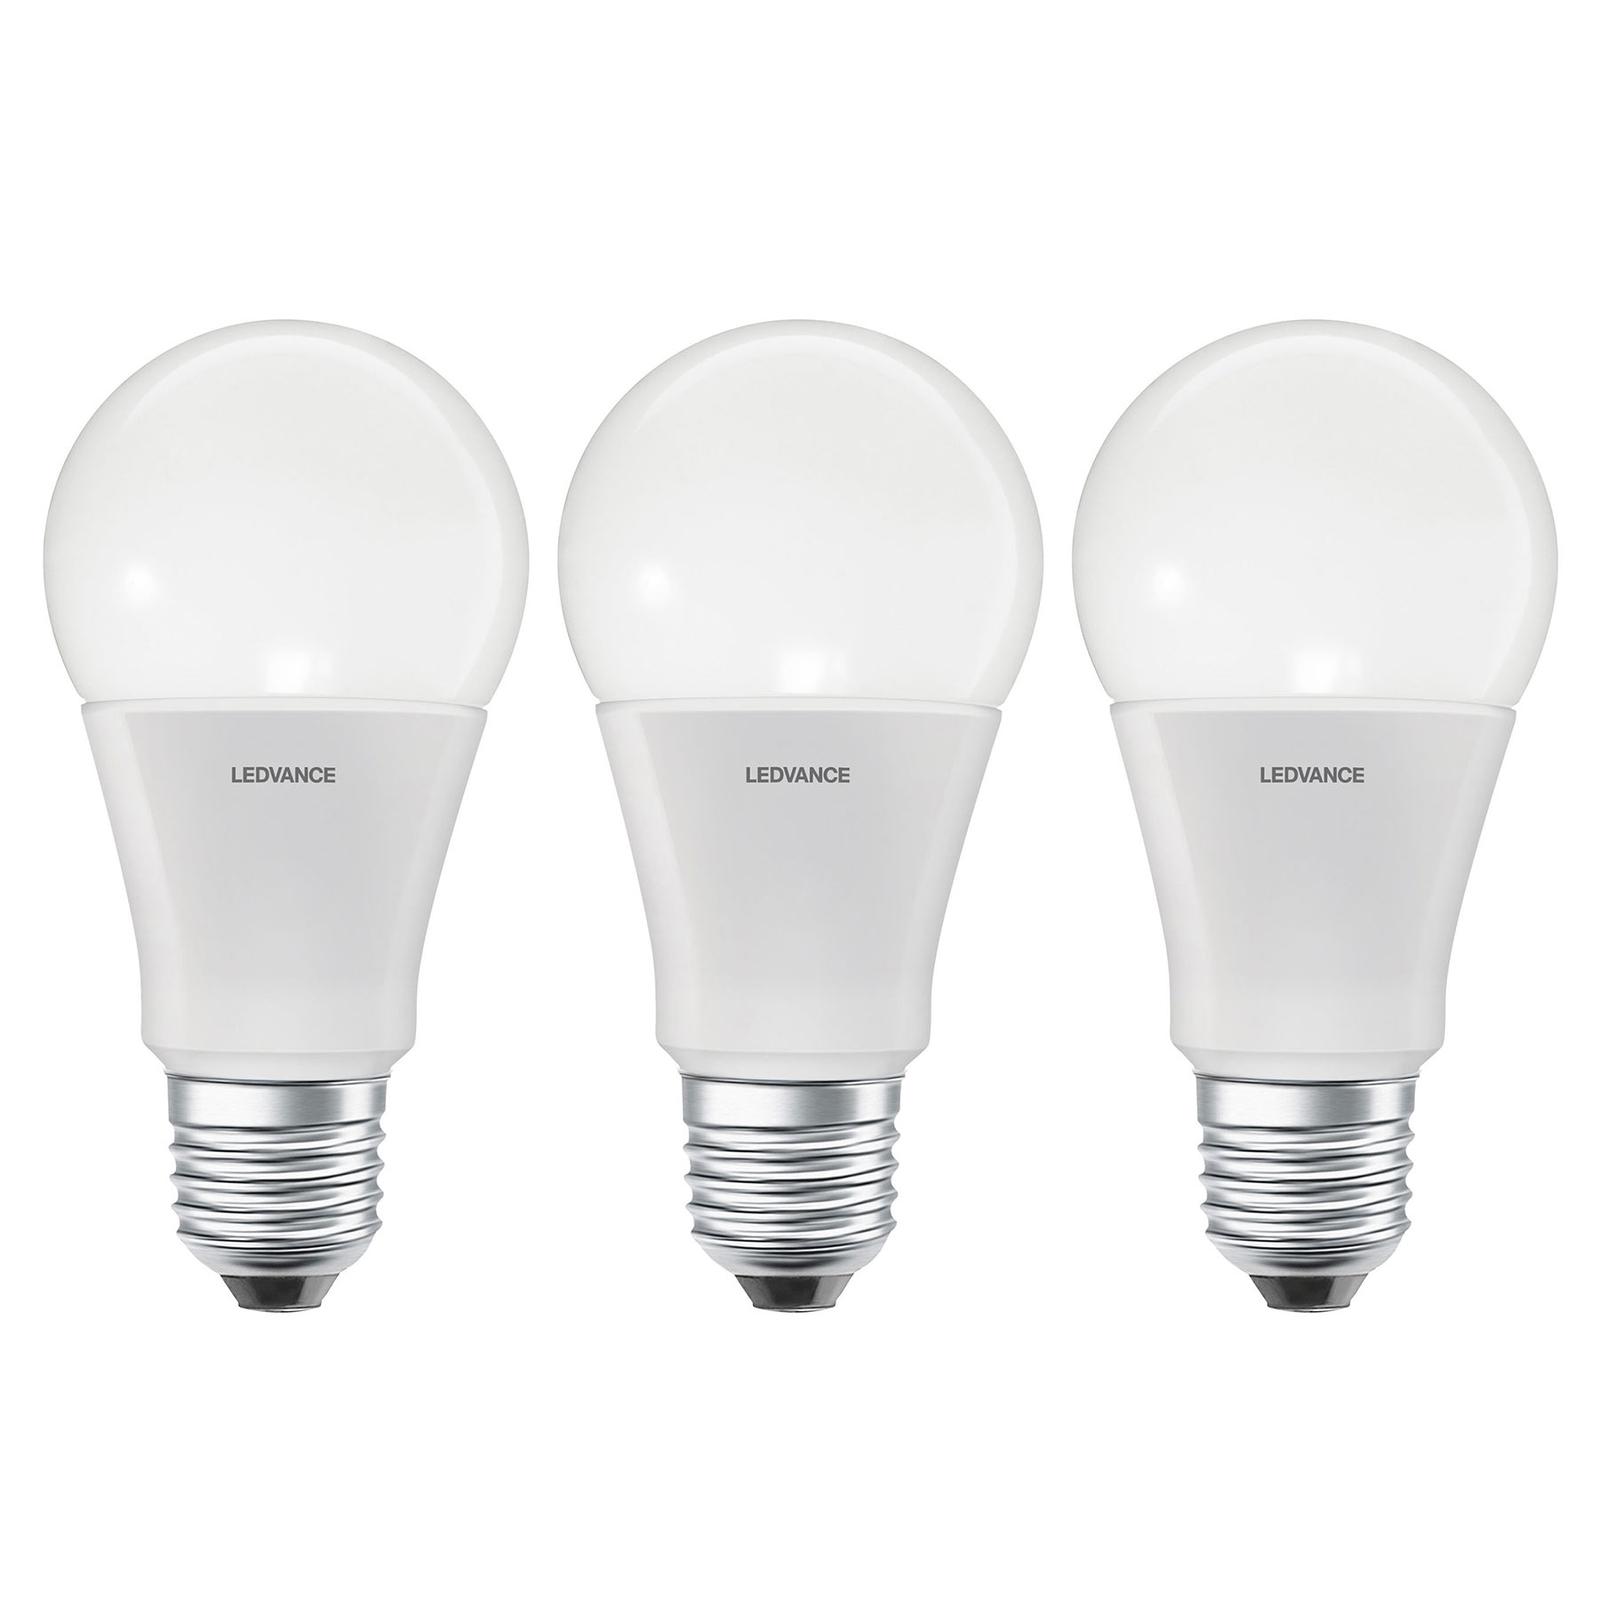 LEDVANCE SMART+ WiFi E27 9W Classic 2700K 3szt.